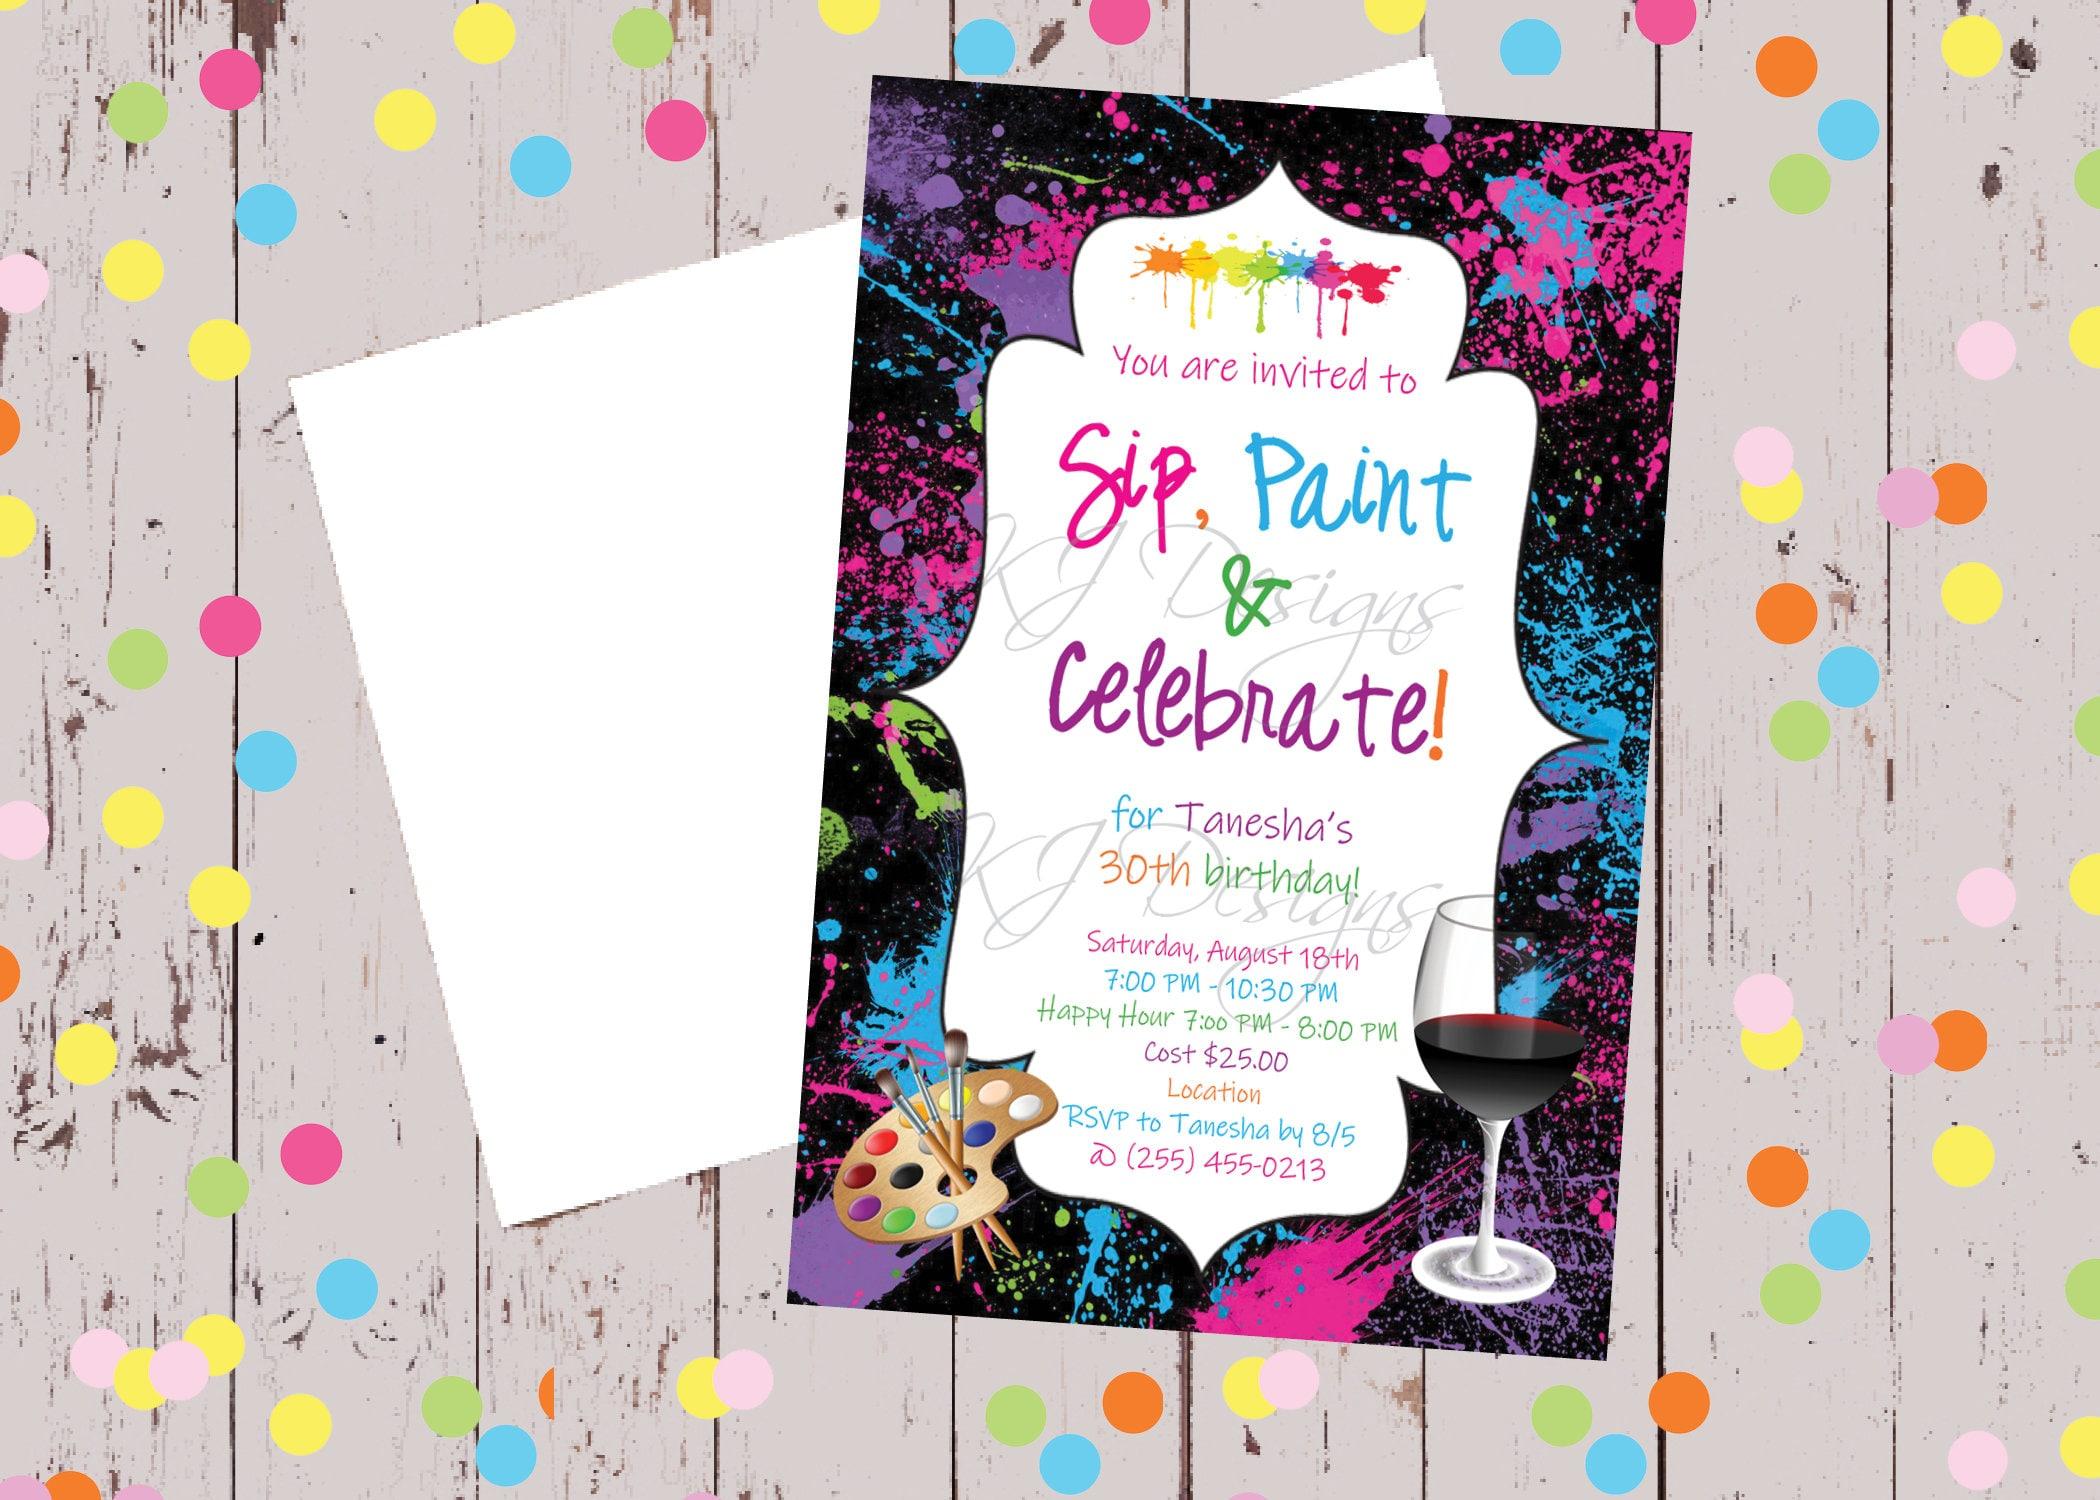 sip paint celebrate birthday birthday invitation sweet | Etsy